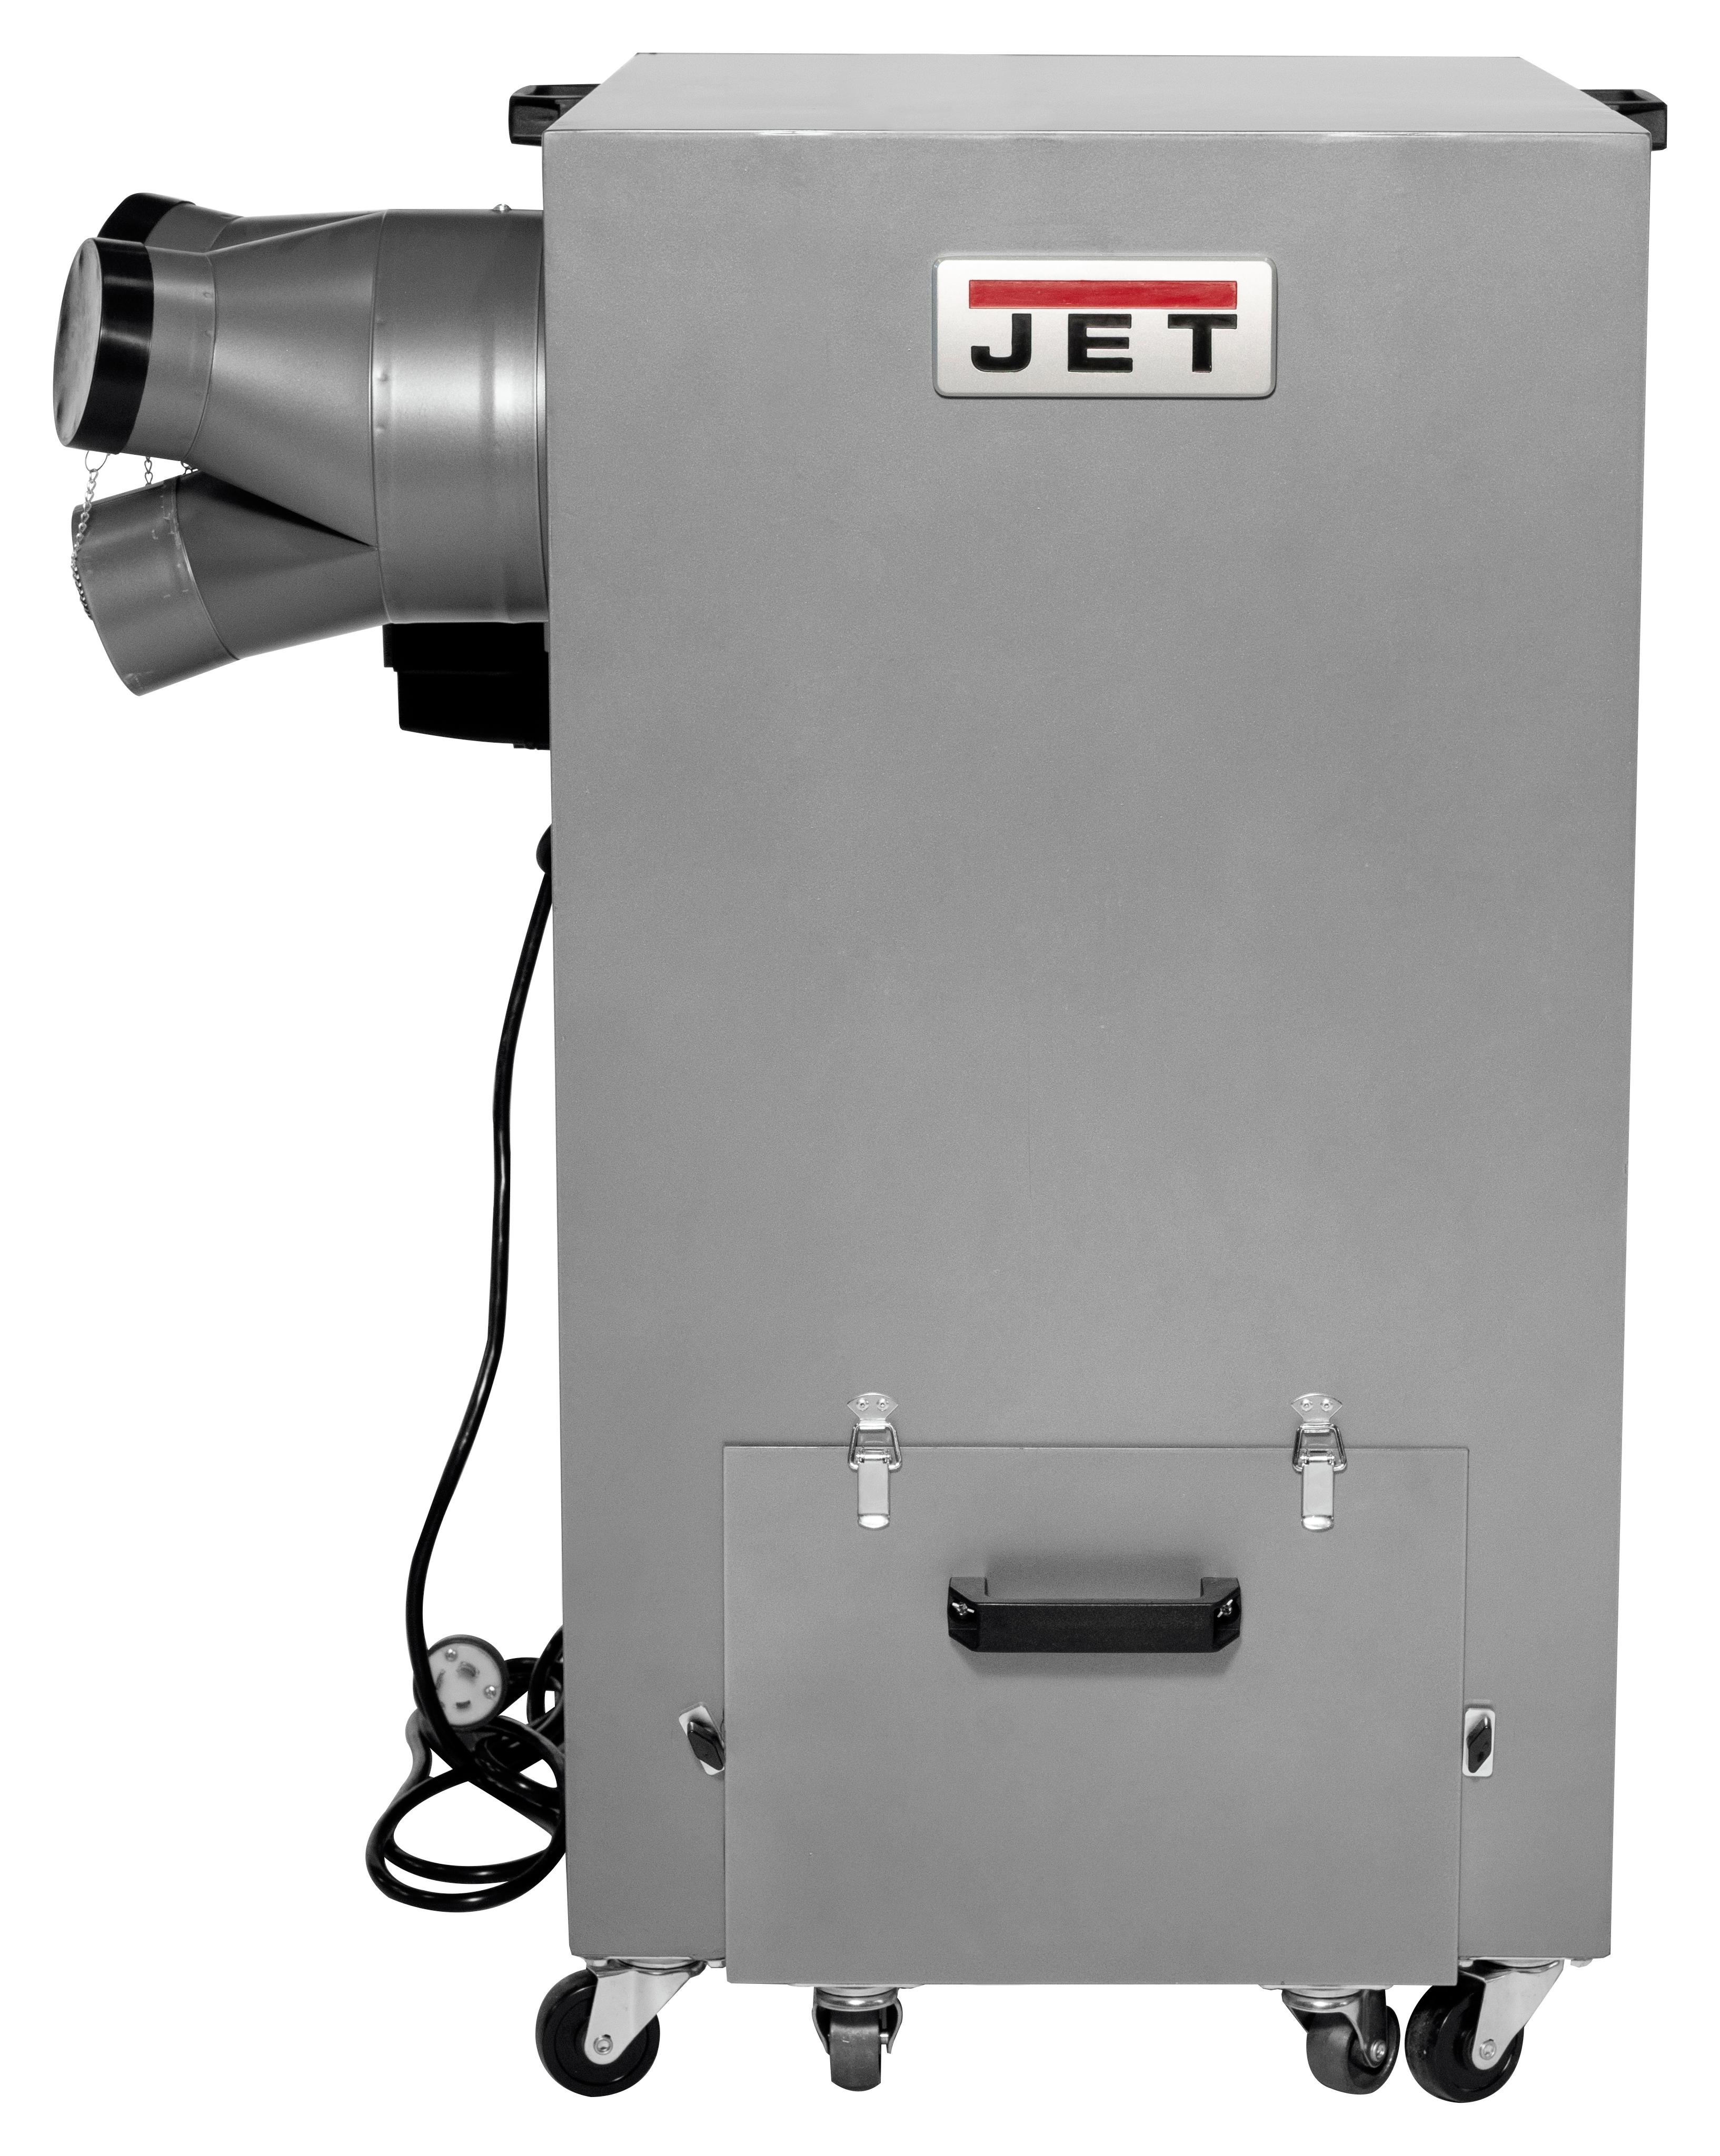 JDC-510  1500CFM Industrial Dust Collector  3HP, 220V, Single Phase